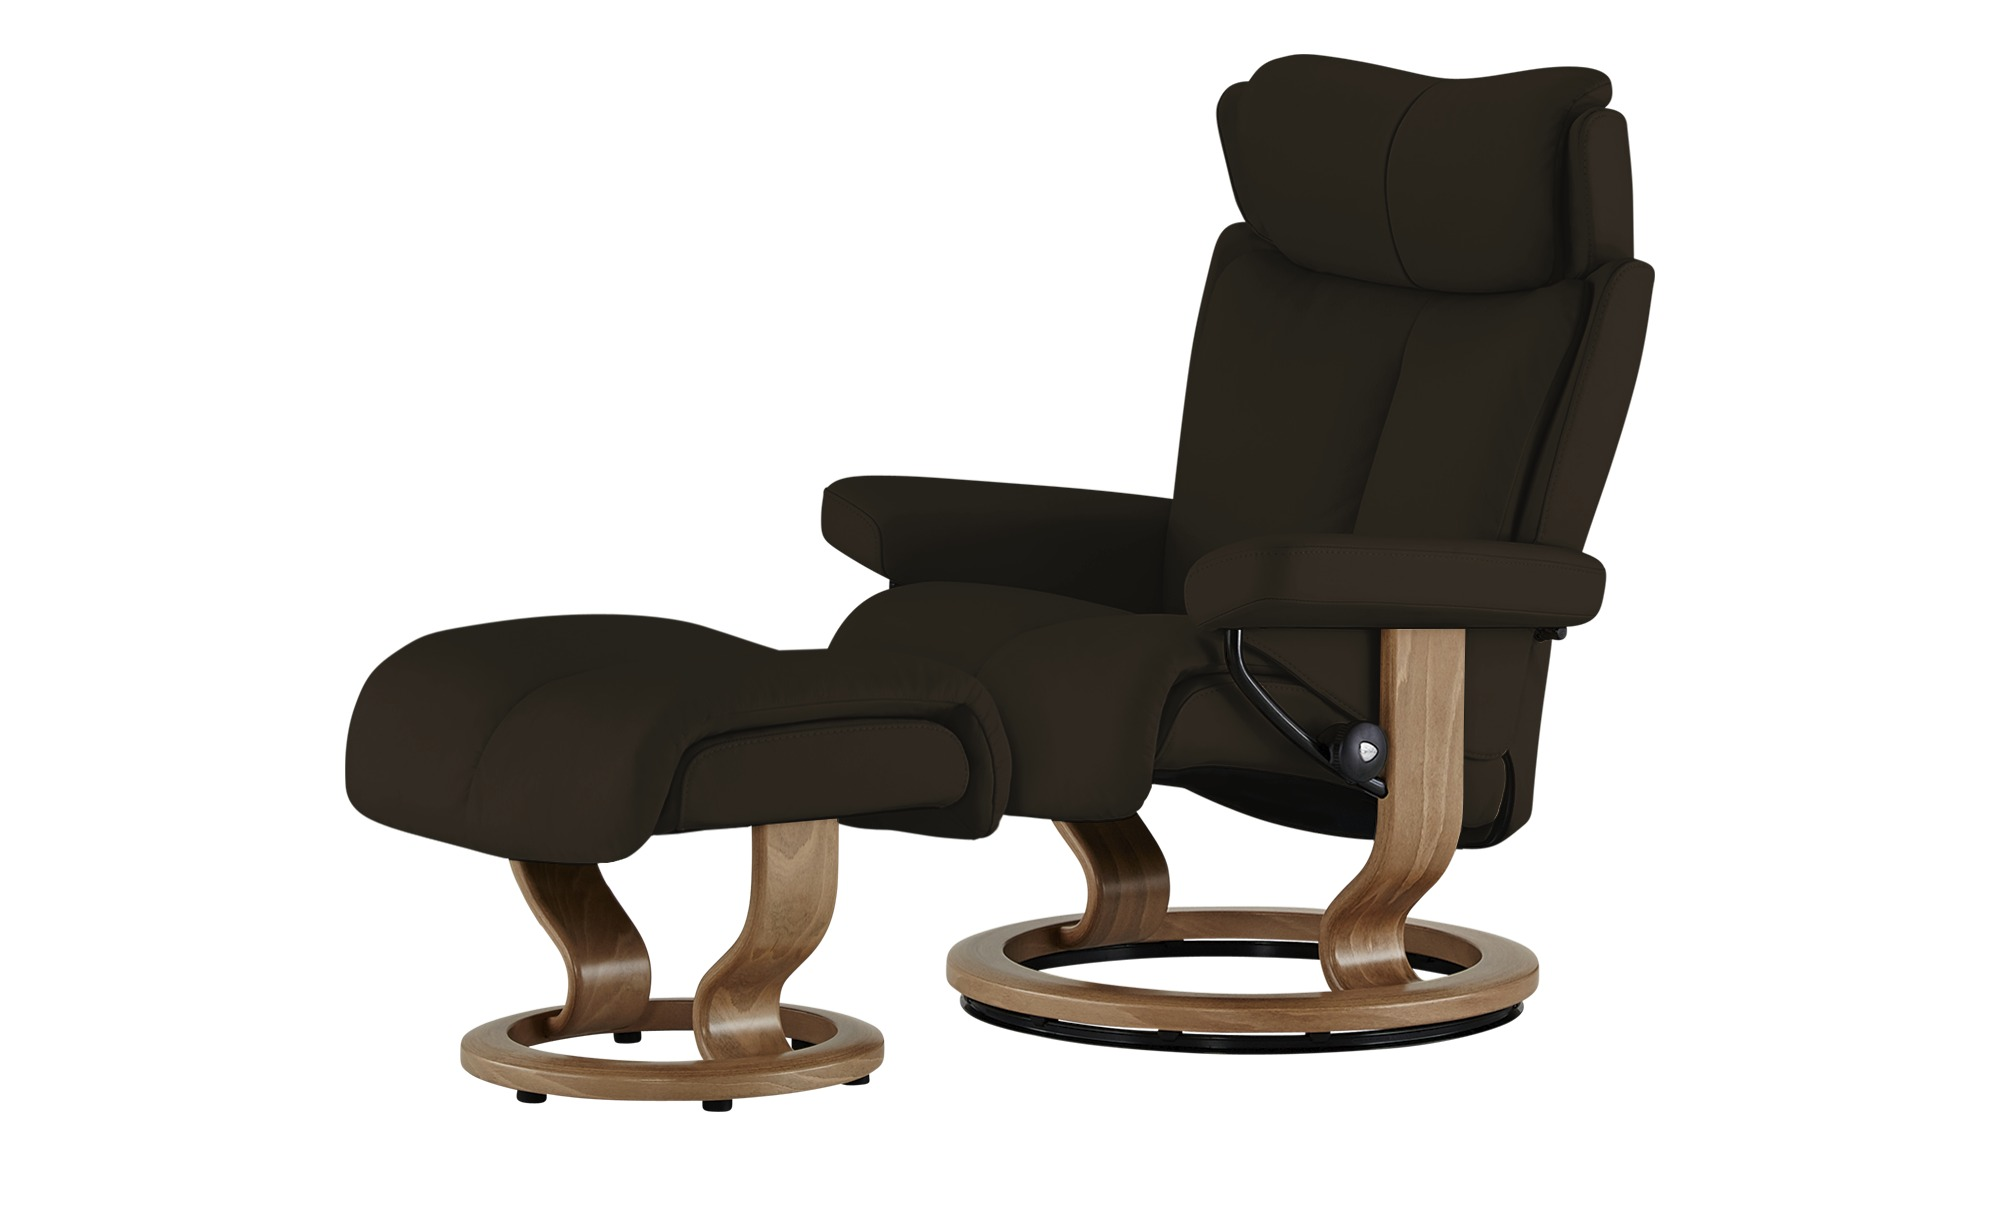 #Stressless Relaxsessel mit Hocker braun – Leder Magic L ¦ braun ¦ Maße (cm): B: 90 H: 111 T: 82 Polstermöbel > Sessel > Fernsehsessel – Höffner#